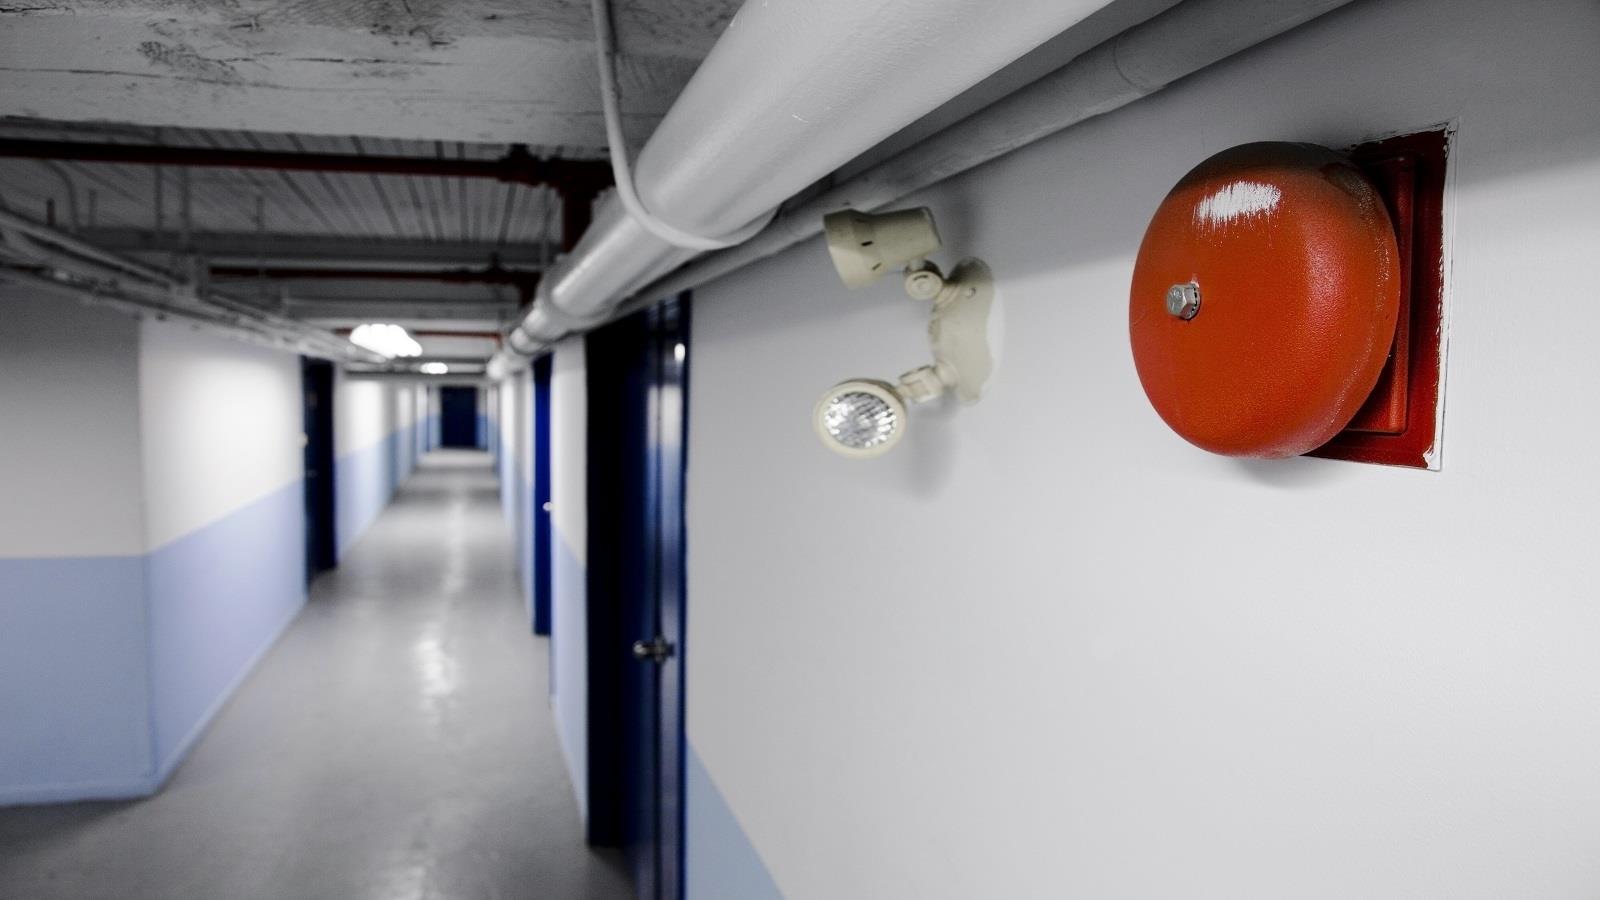 SmartBrains-Fire-Alarm-Design-Engineering-Online-Workshop-Industry-Training-Certification-Noida-Delhi-Chennai-Mumbai-Dehradun